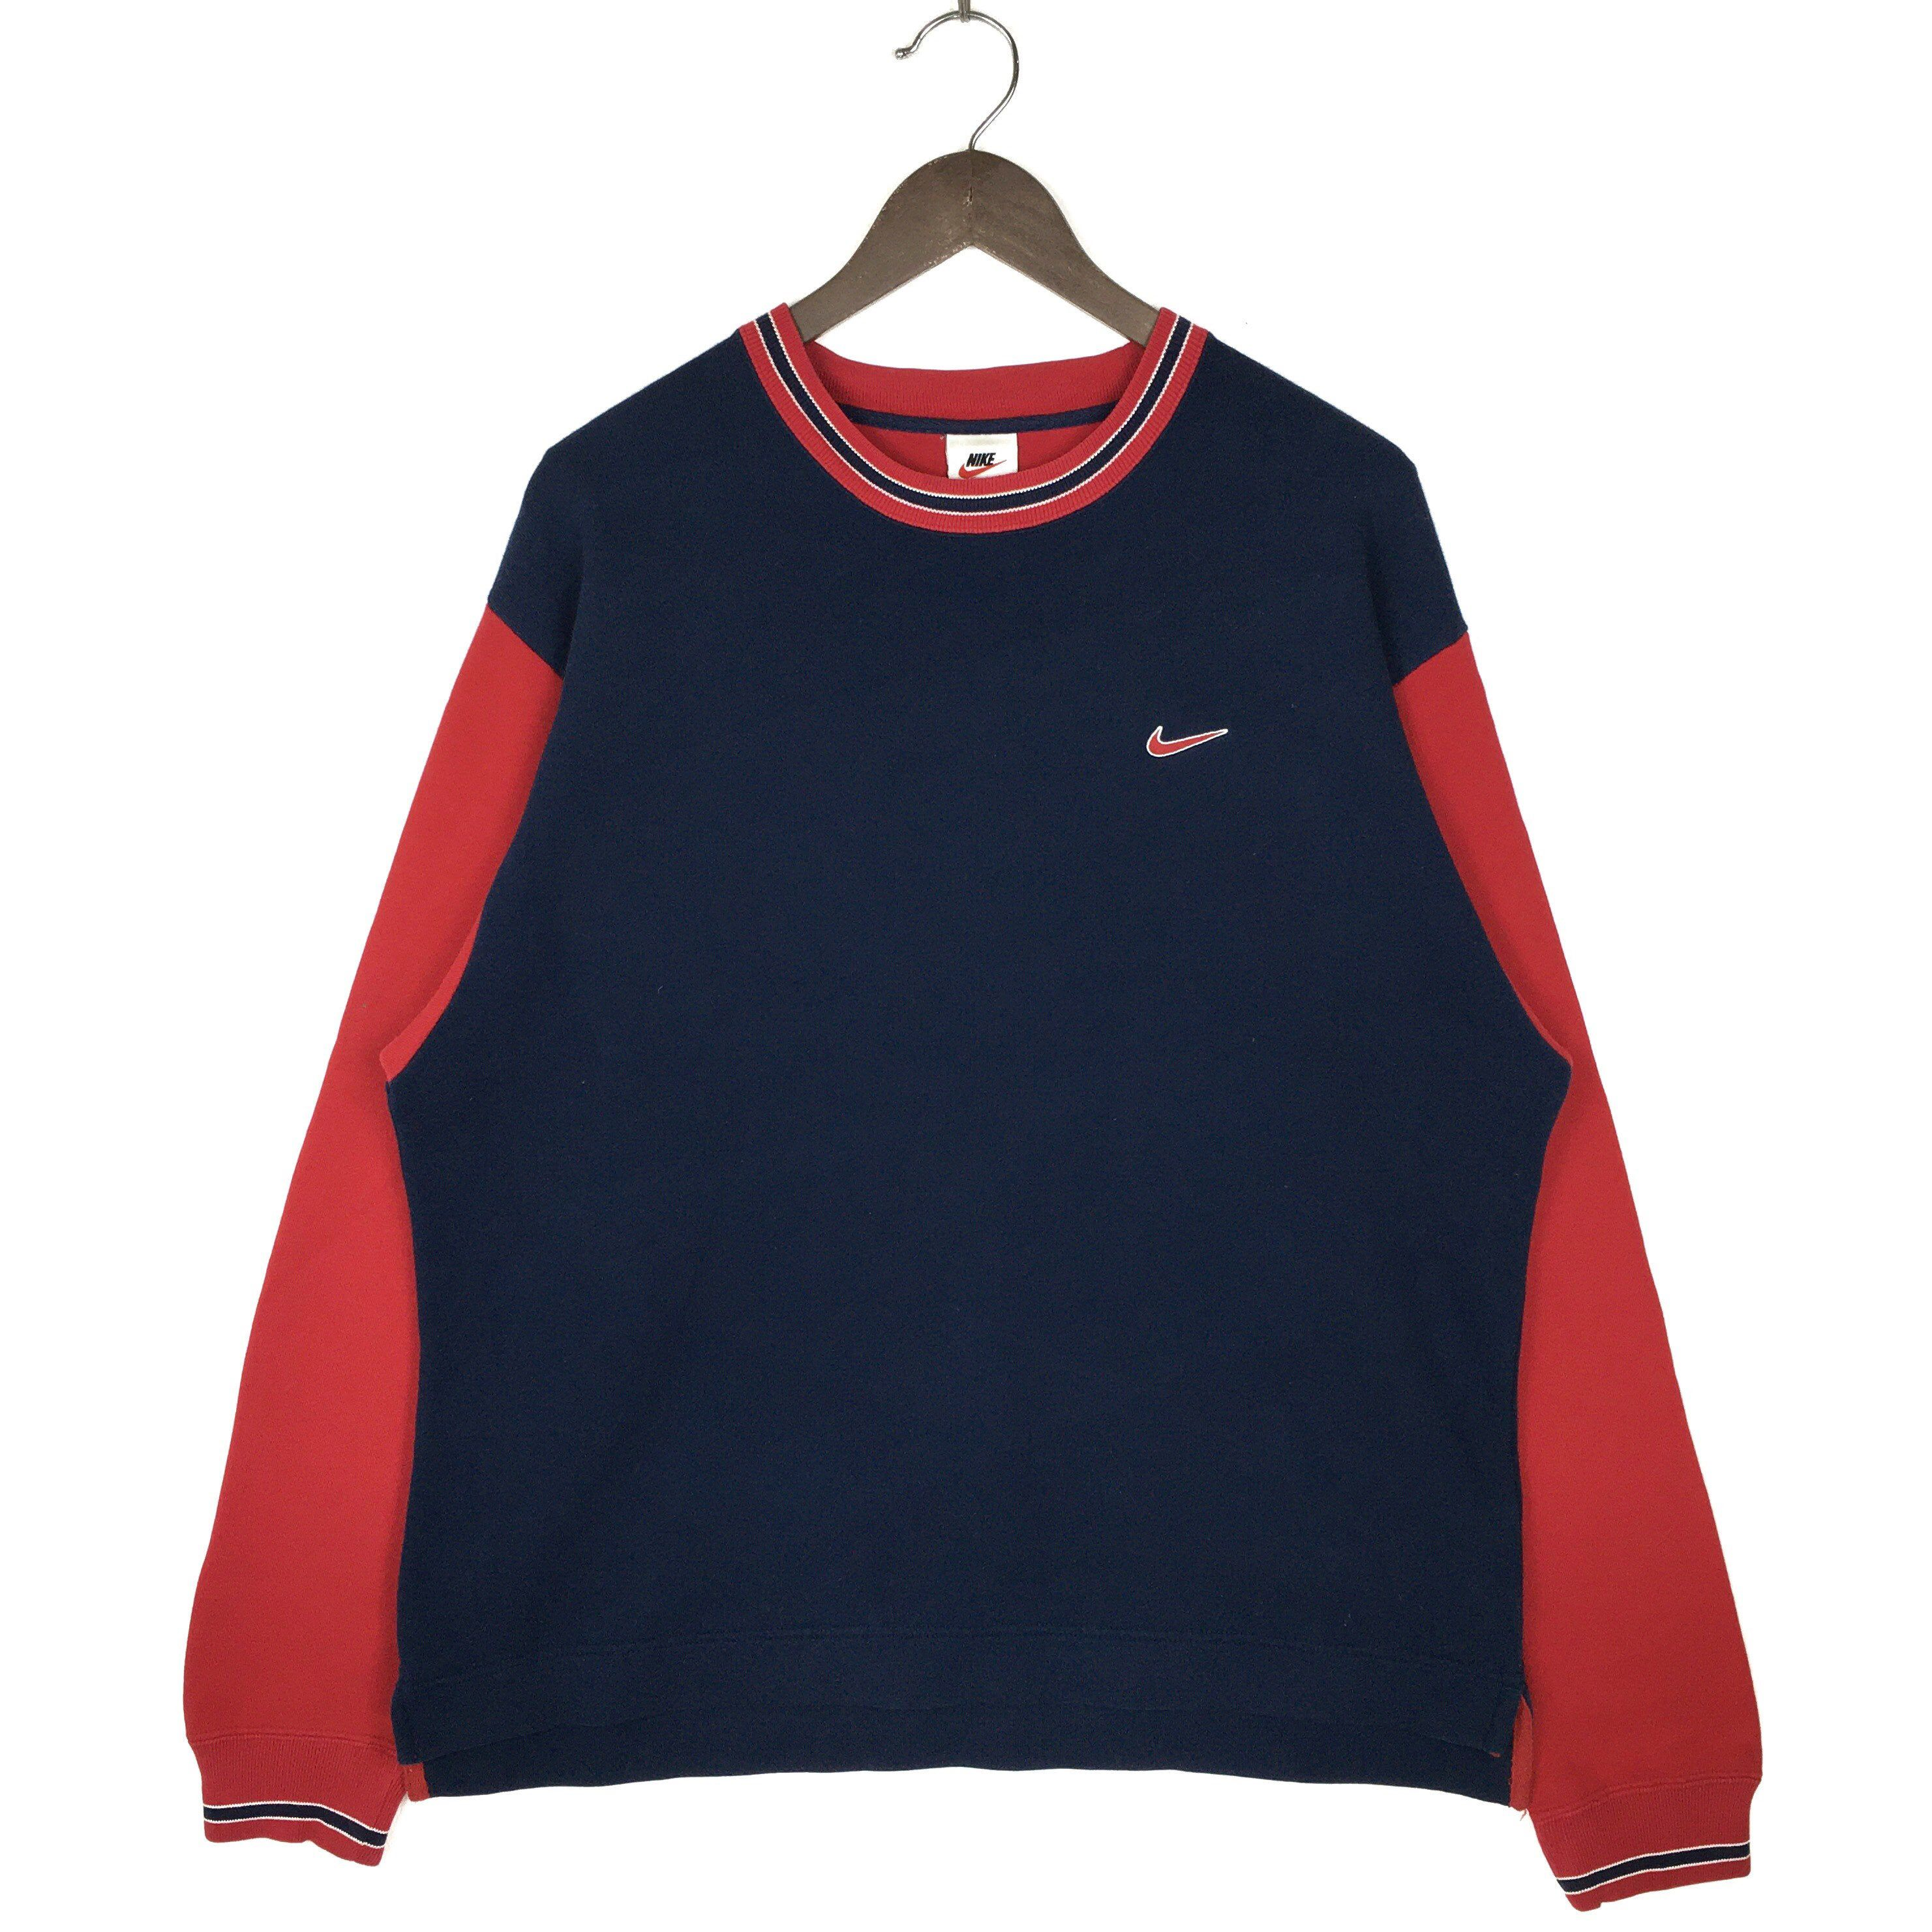 Vintage Nike Swoosh Sweatshirt Nike Crewneck Pullover Jumper Etsy Vintage Nike Nike Crewneck Vintage Nike Sweatshirt [ 2962 x 2962 Pixel ]